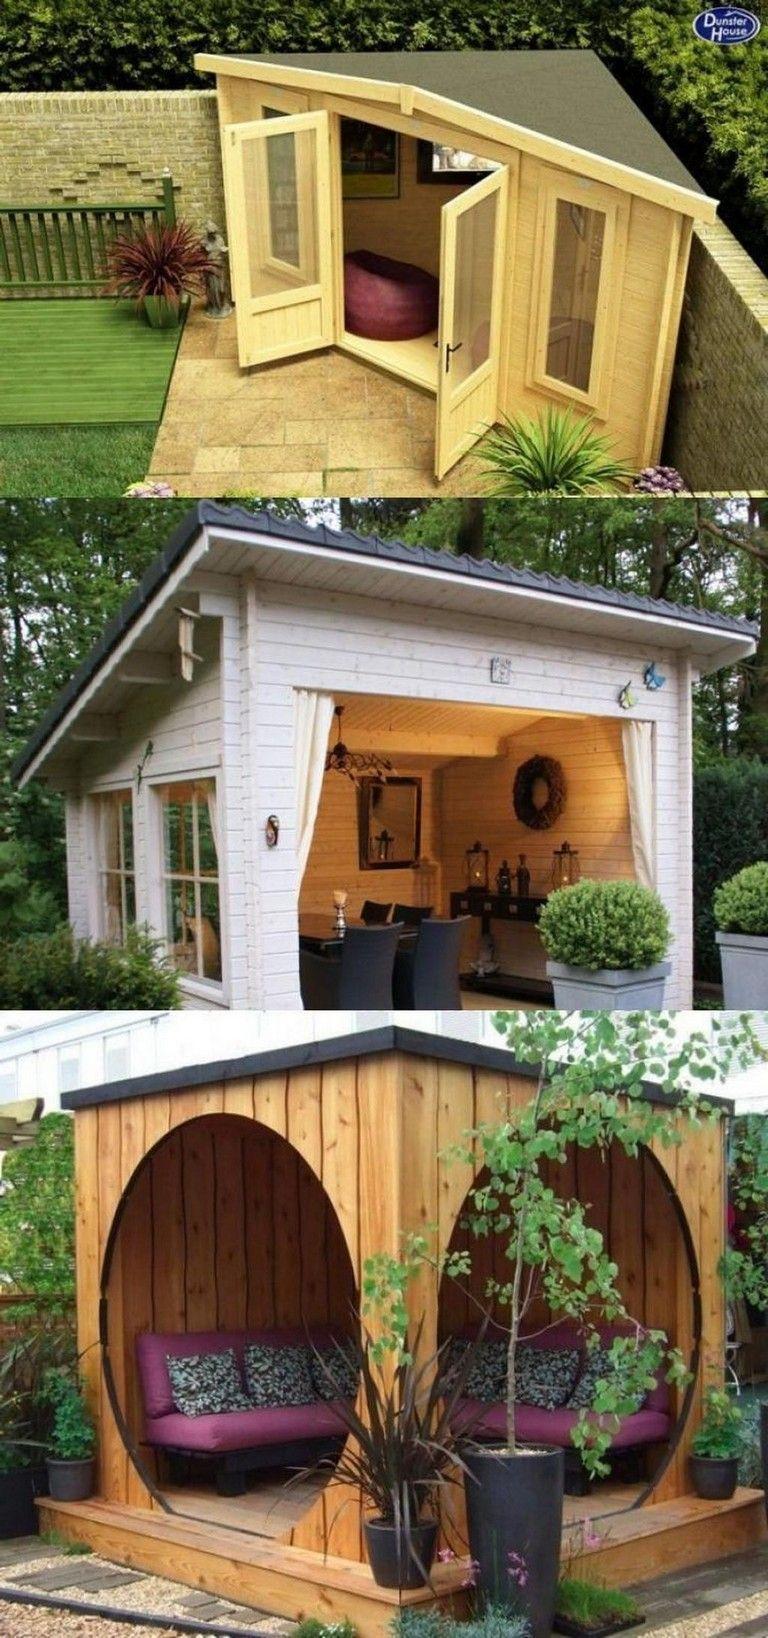 39 Nice Diy Backyard Gazebo Design Decoration Ideas Diy Gazebo